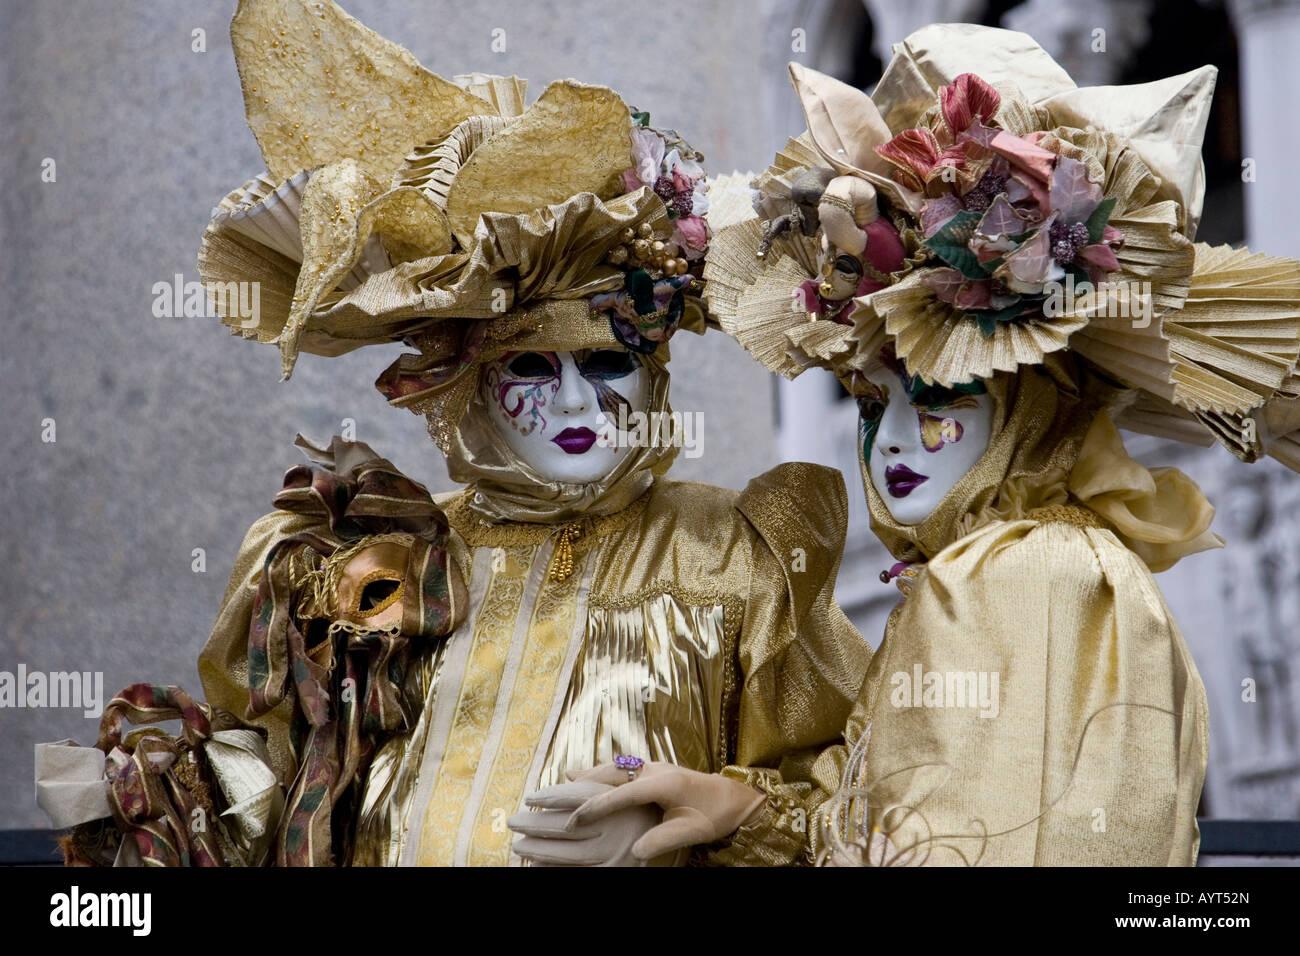 zwei goldene kost me und masken carnevale di venezia karneval in venedig italien stockfoto. Black Bedroom Furniture Sets. Home Design Ideas